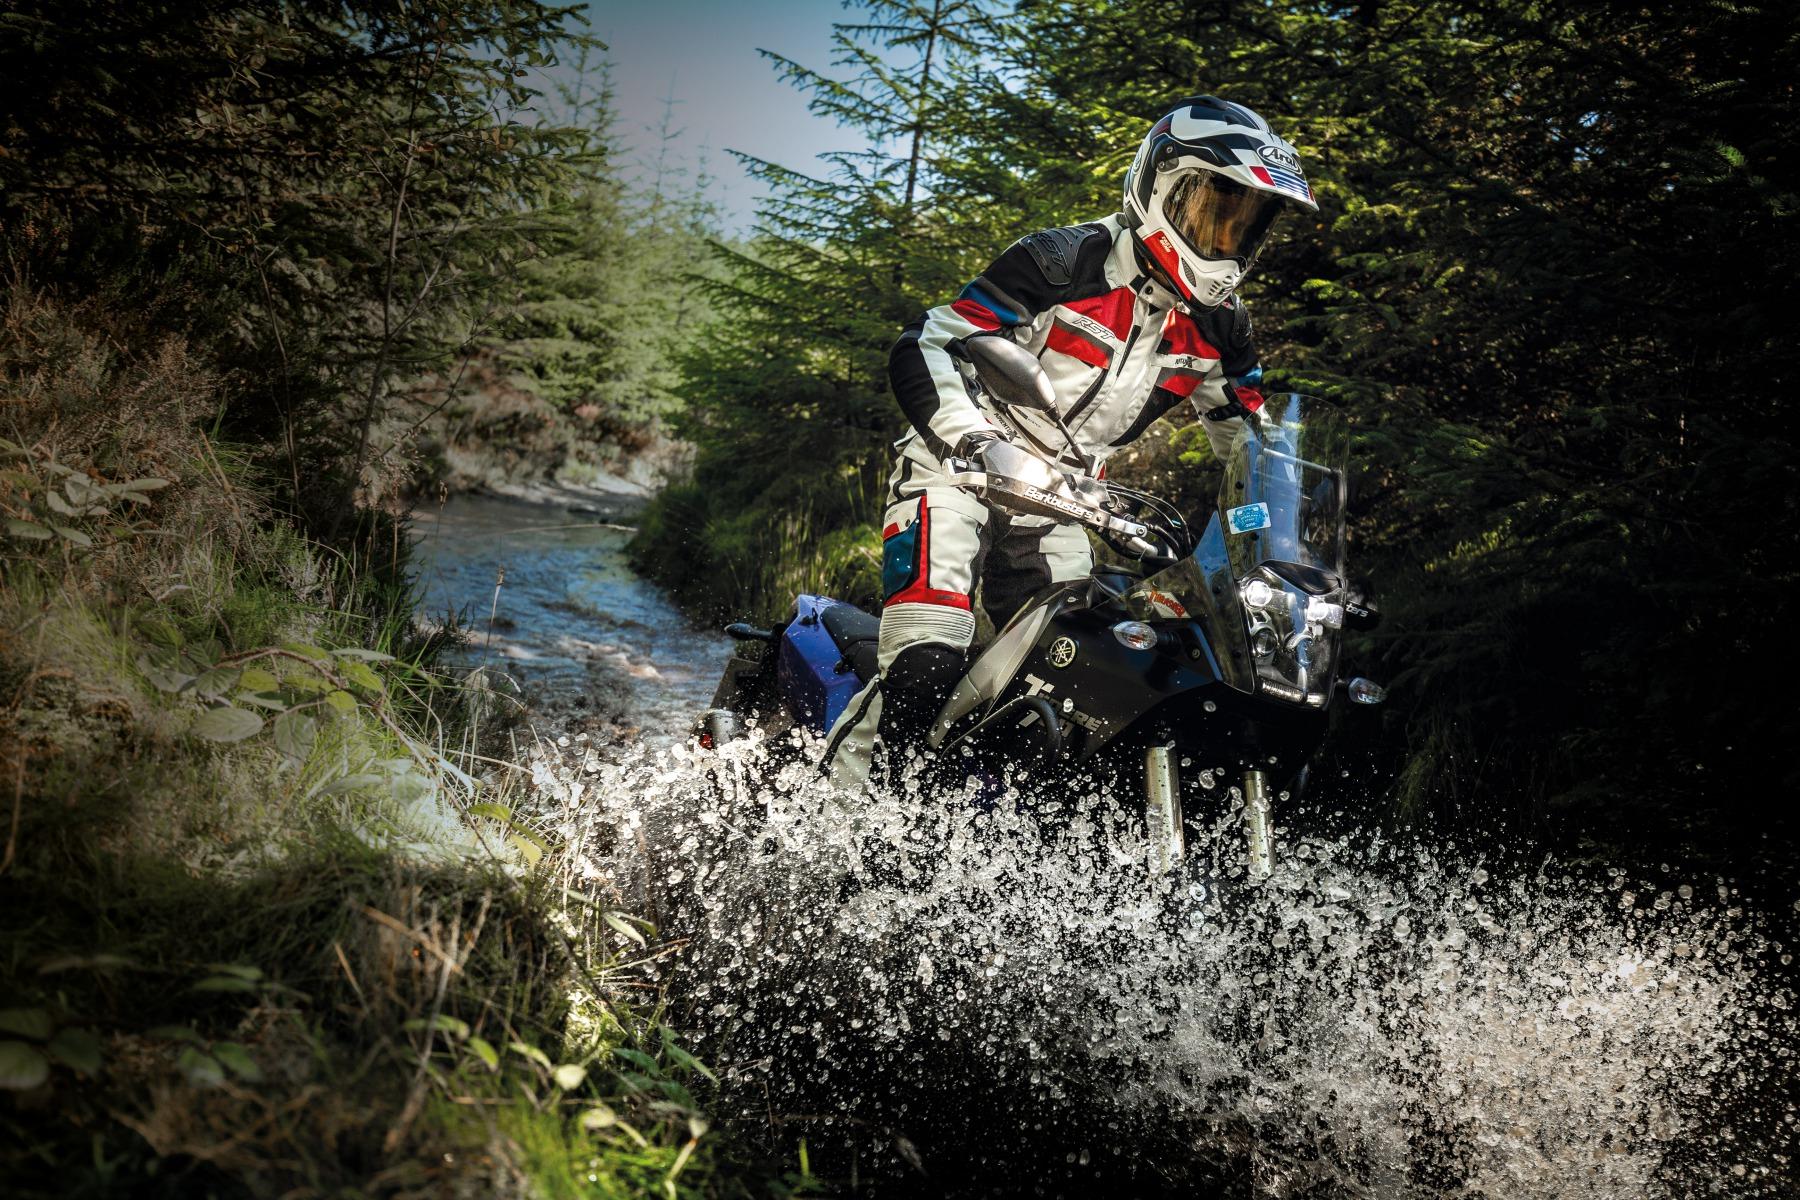 102409-rst-pro-series-adventure-x-jacket-blue-lifestyle-01